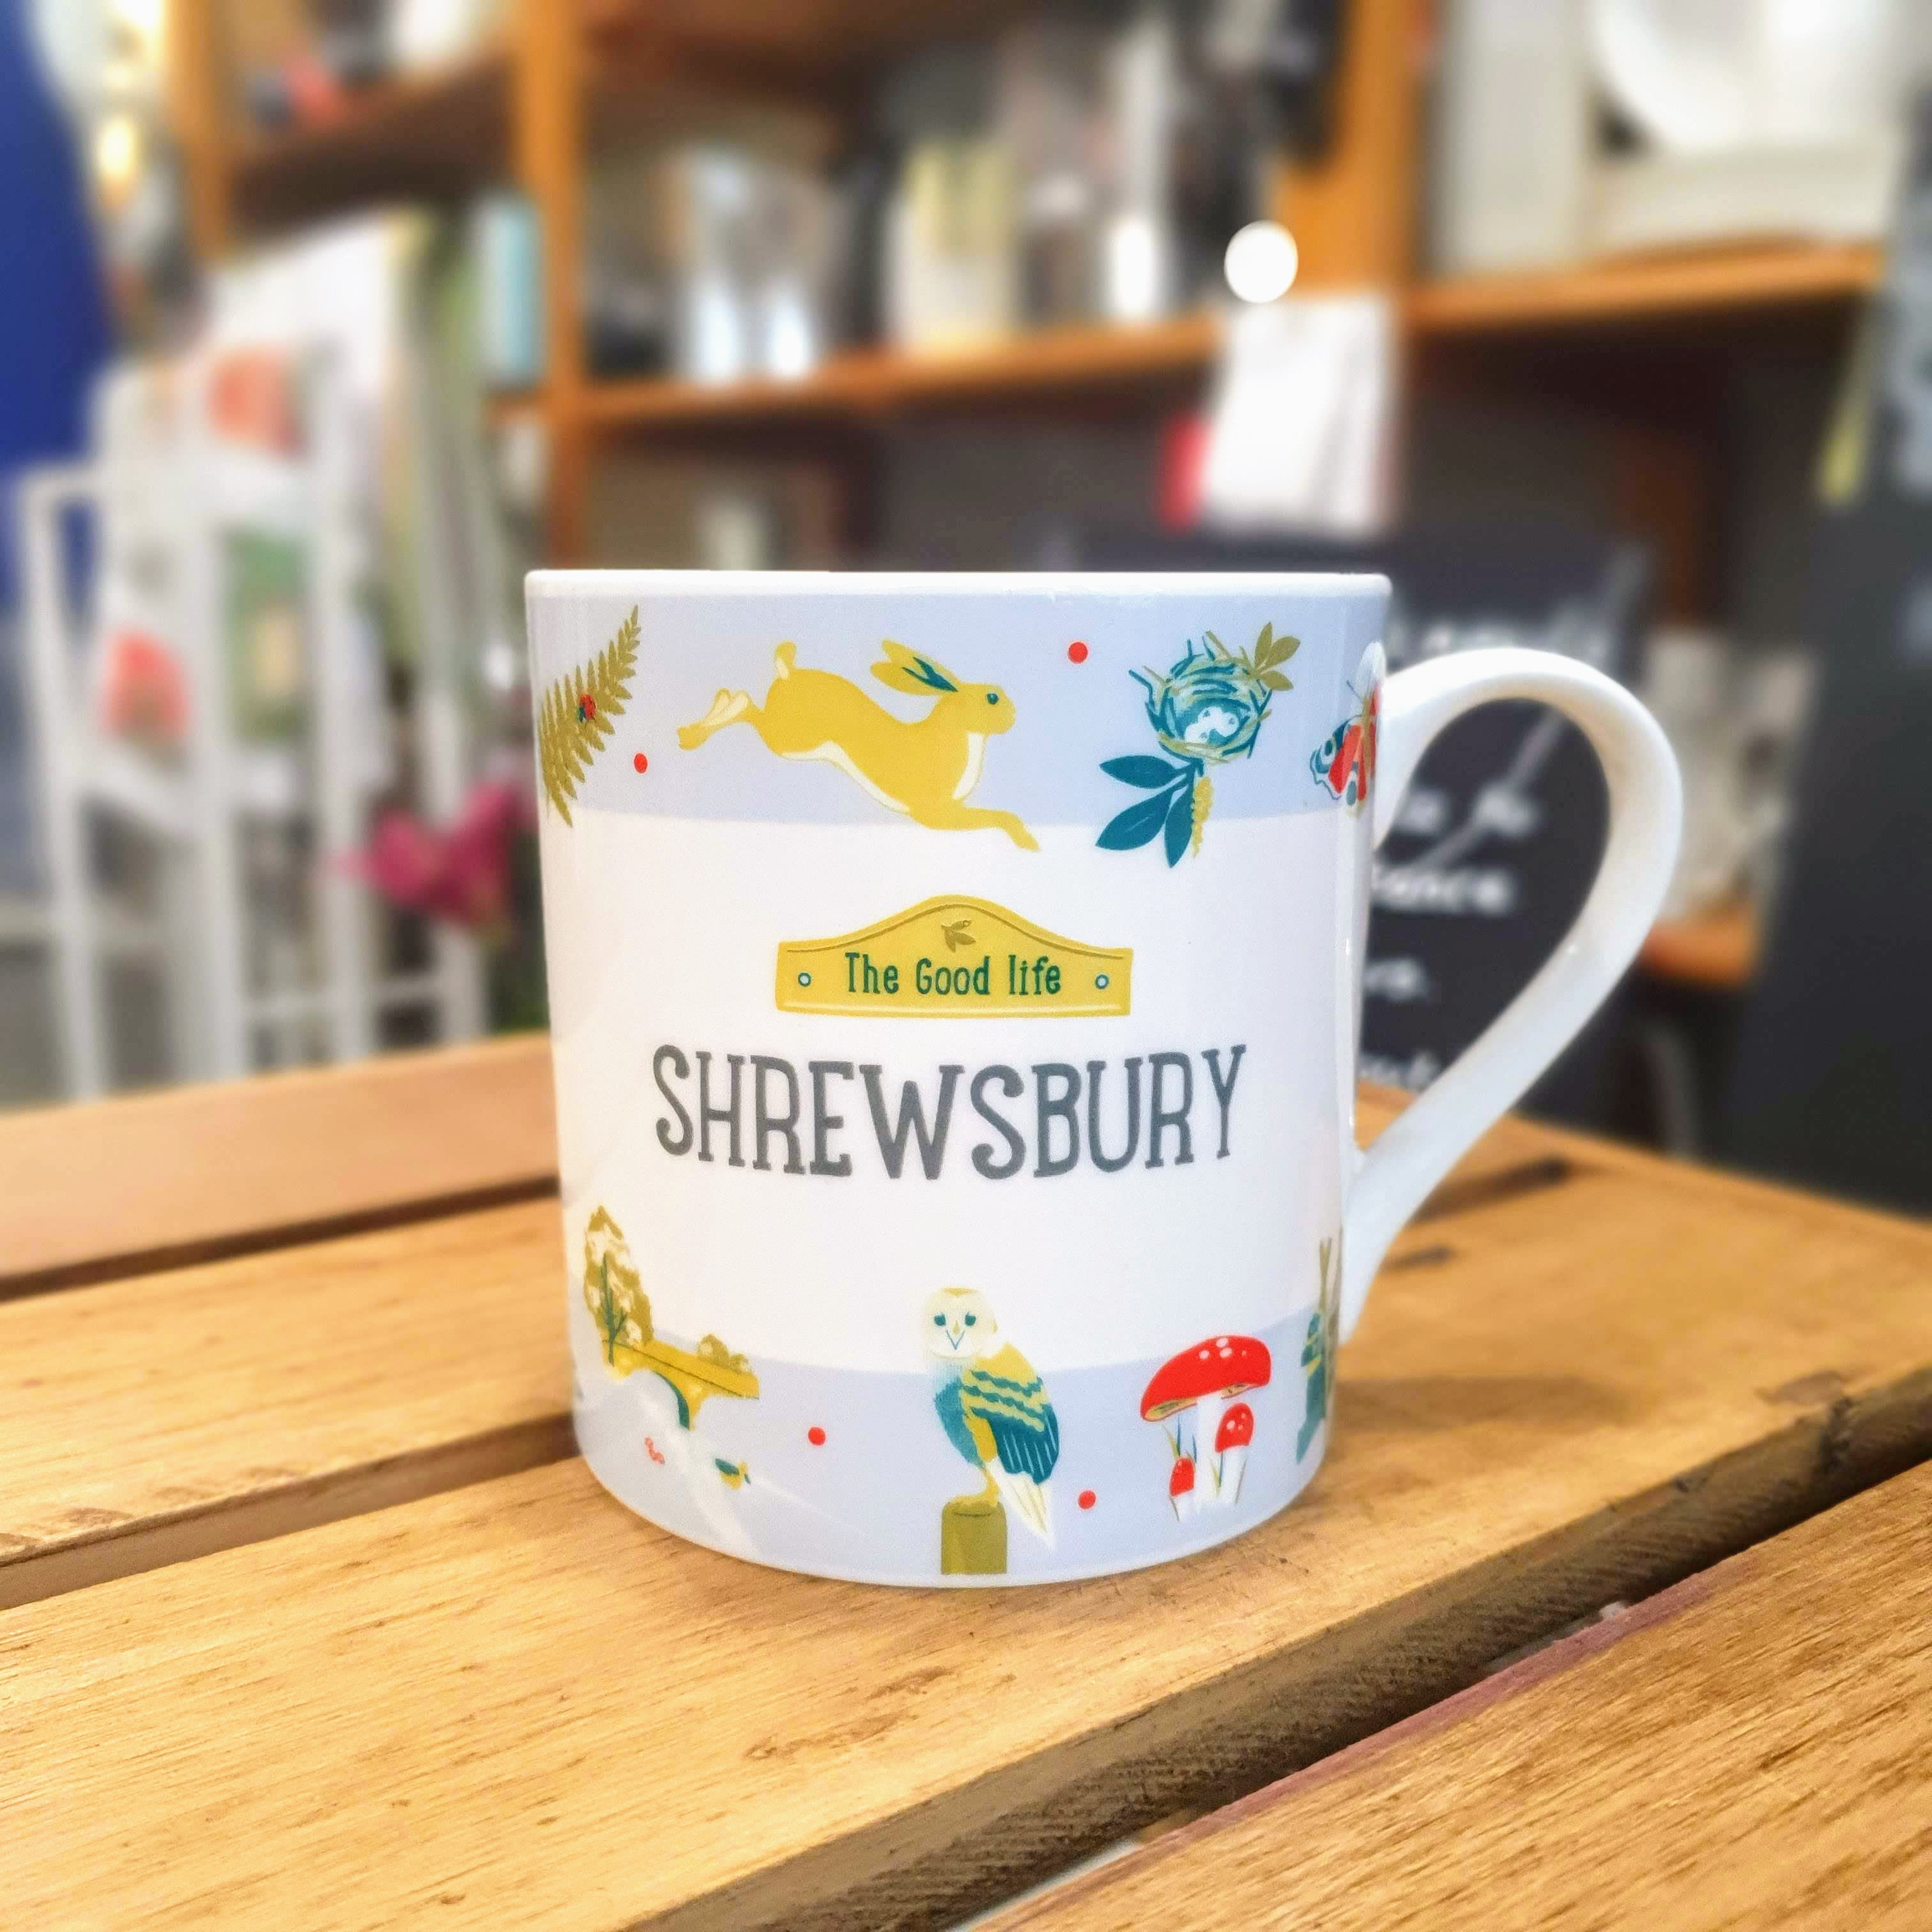 Shrewsbury good life china mug